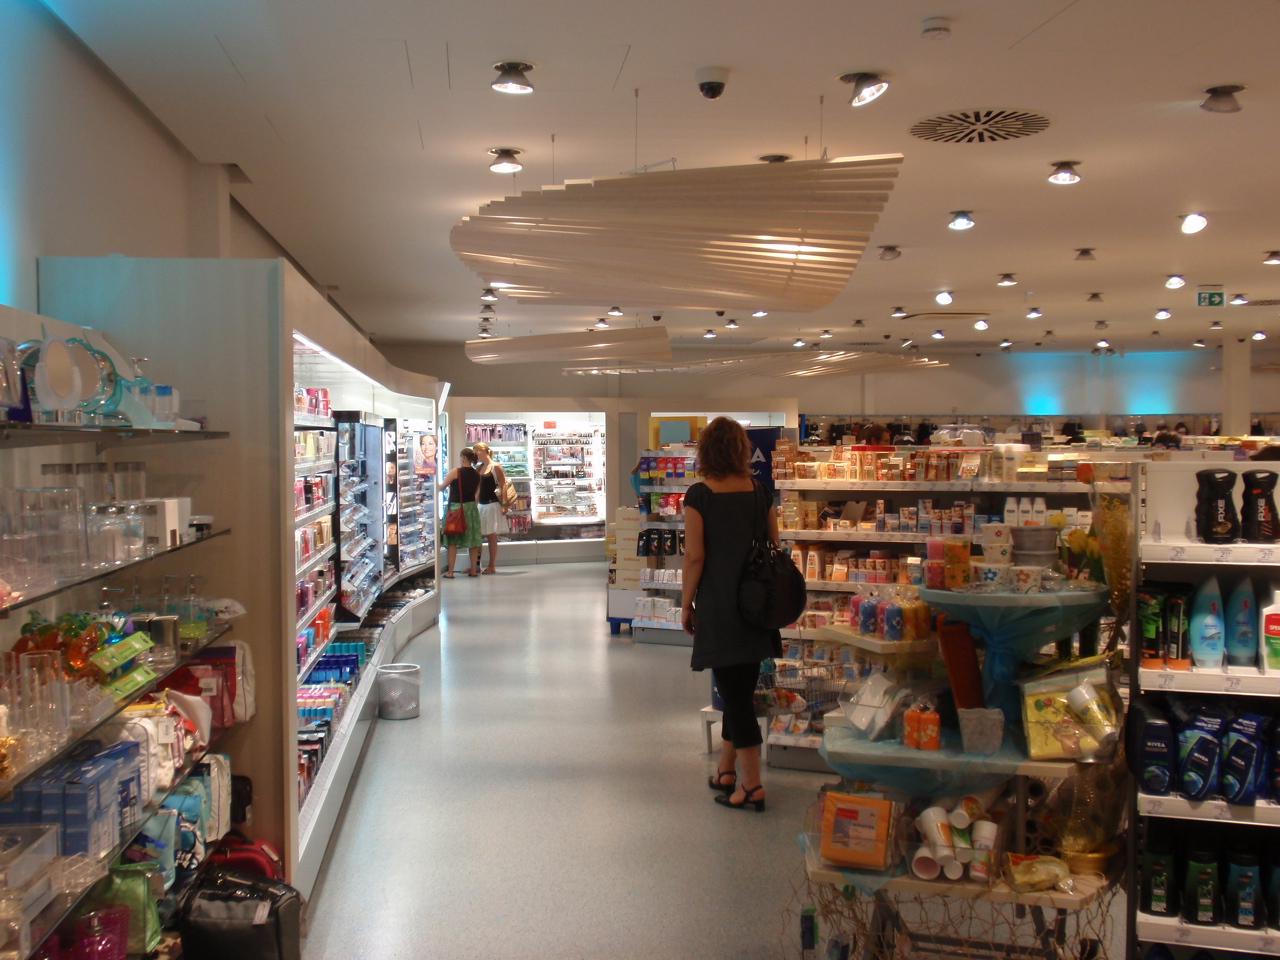 Drogeriemärkte Köln-Bonn